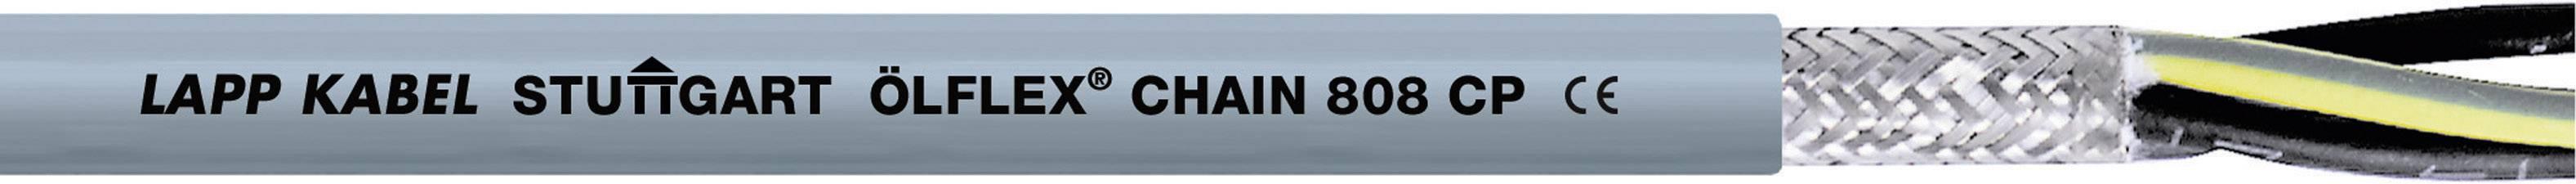 Žíla kabelu LappKabel ÖLFLEX CHAIN 808 CP 7G0,5 (1027755), 7x 0,5 mm², polyurethan, Ø 8,5 mm, stíněný, 50 m, š